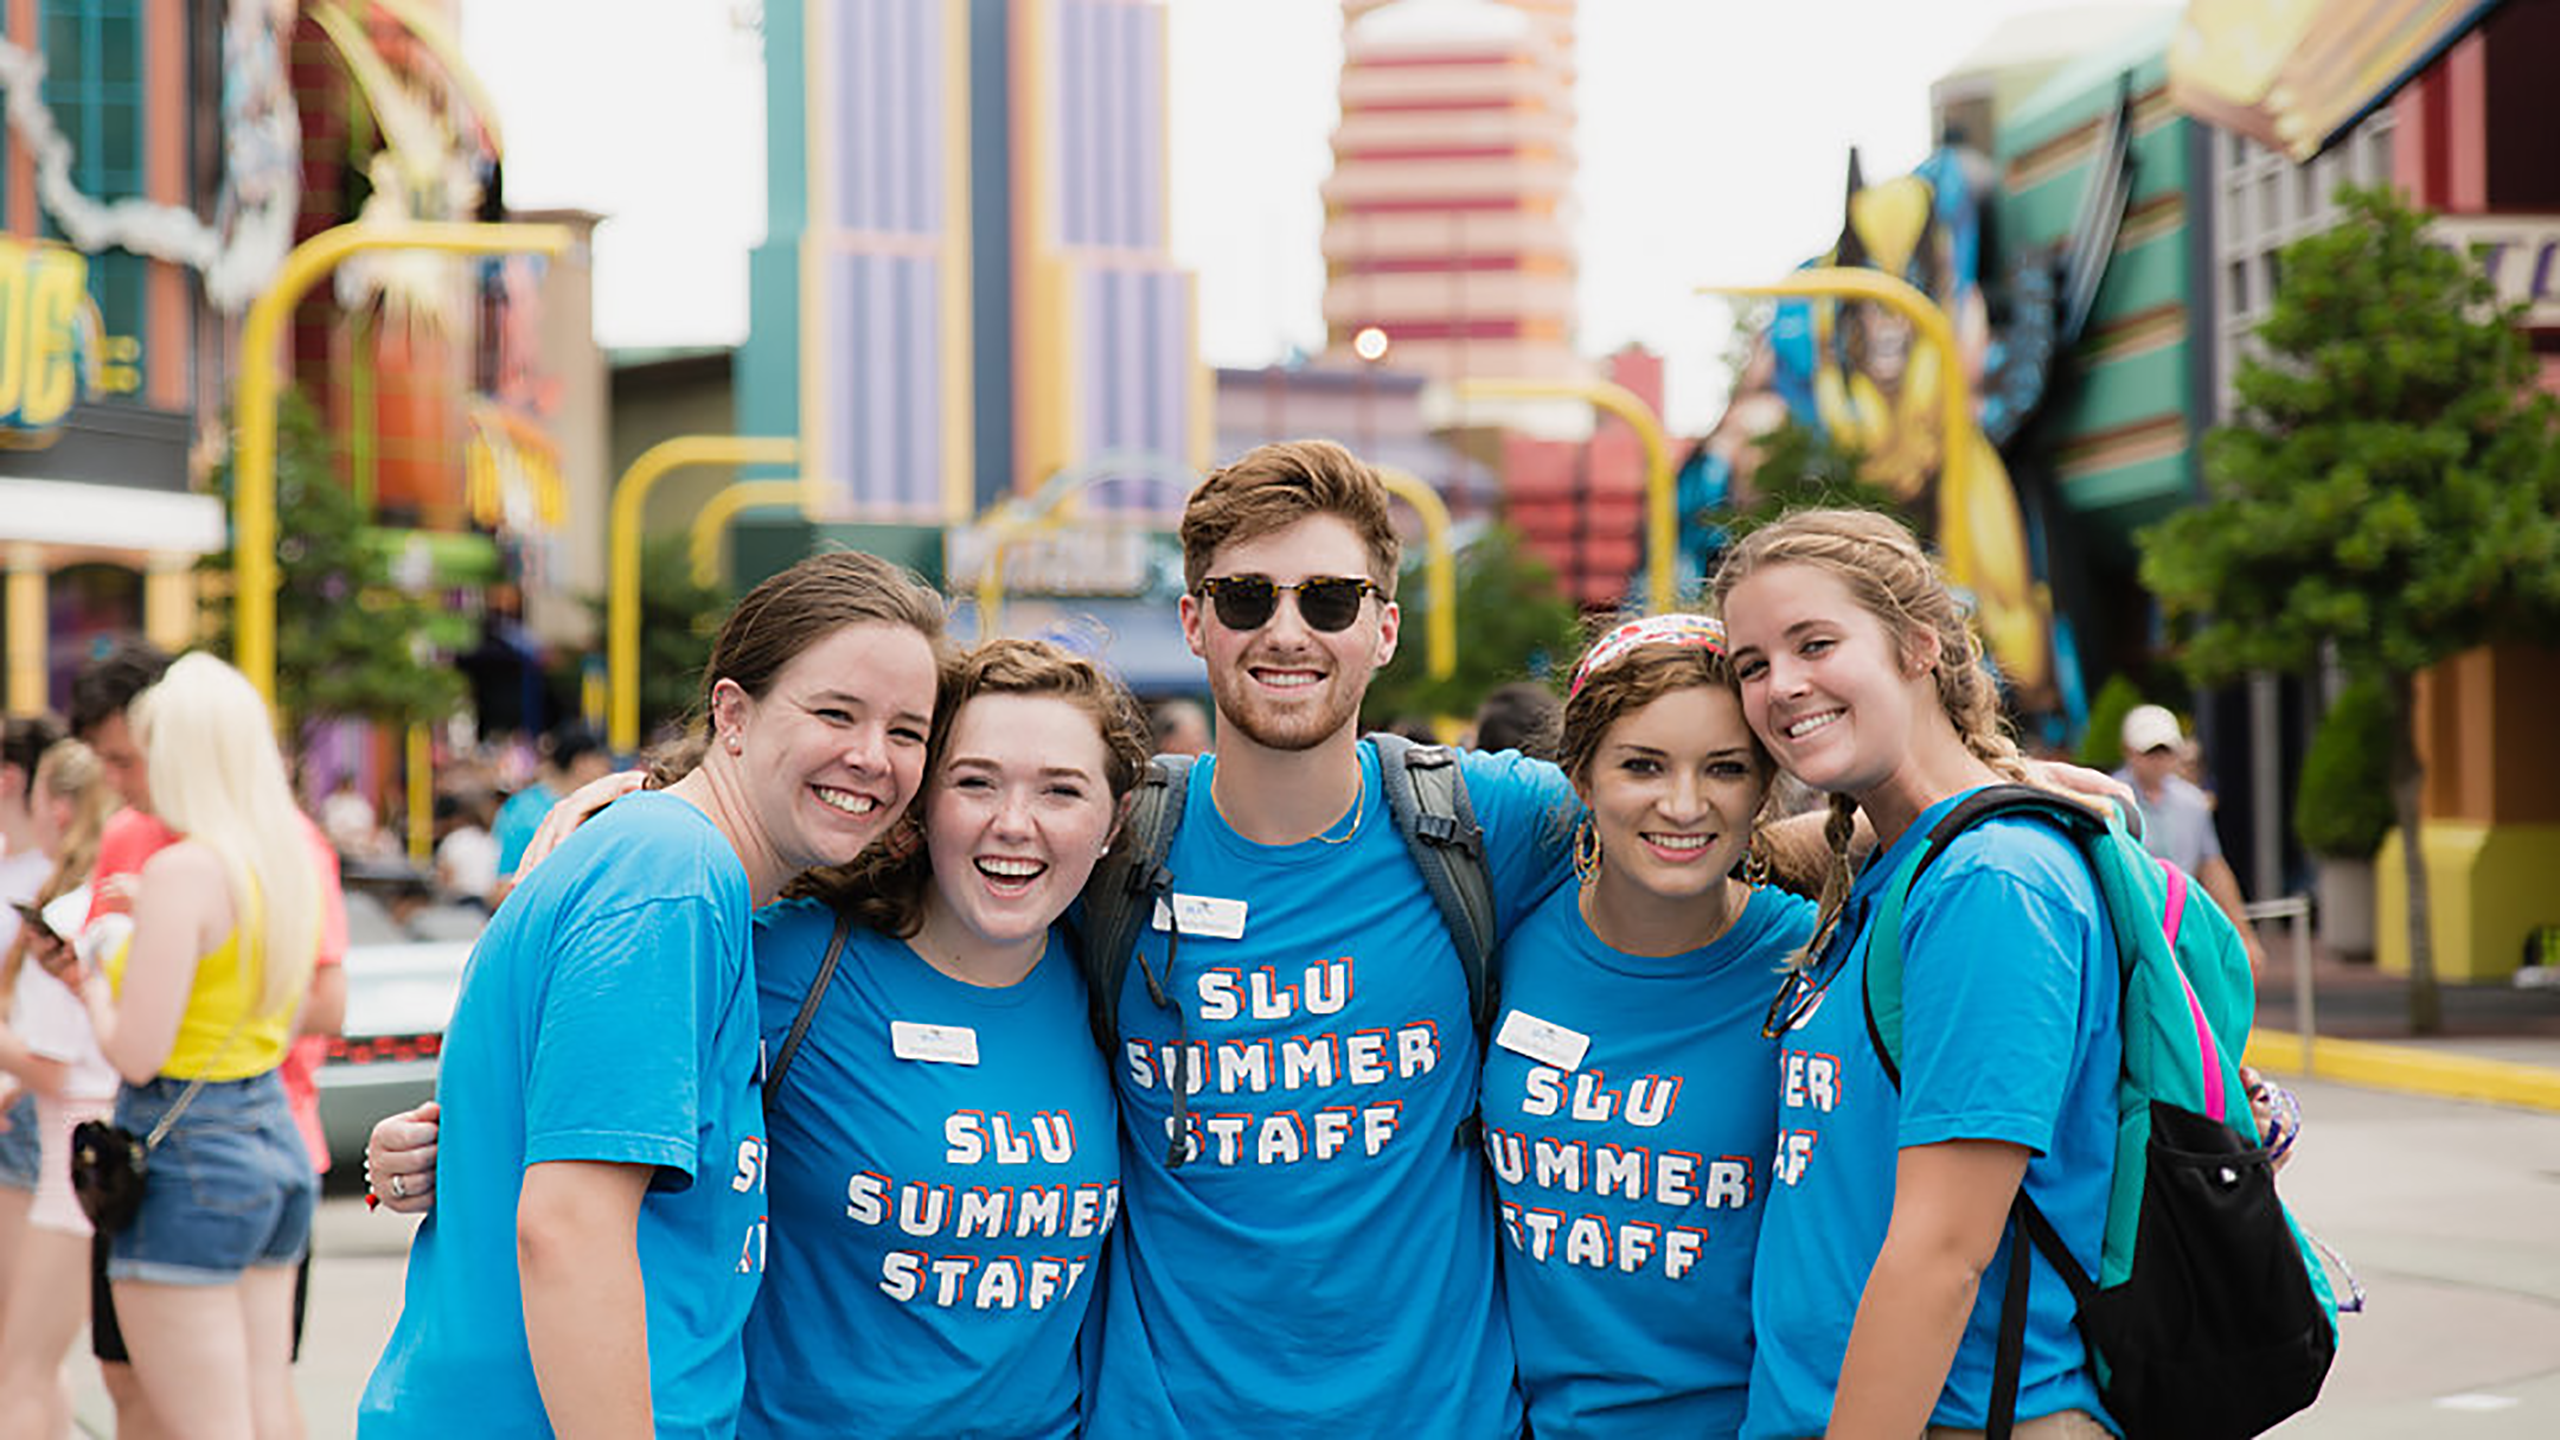 A group of SLU students